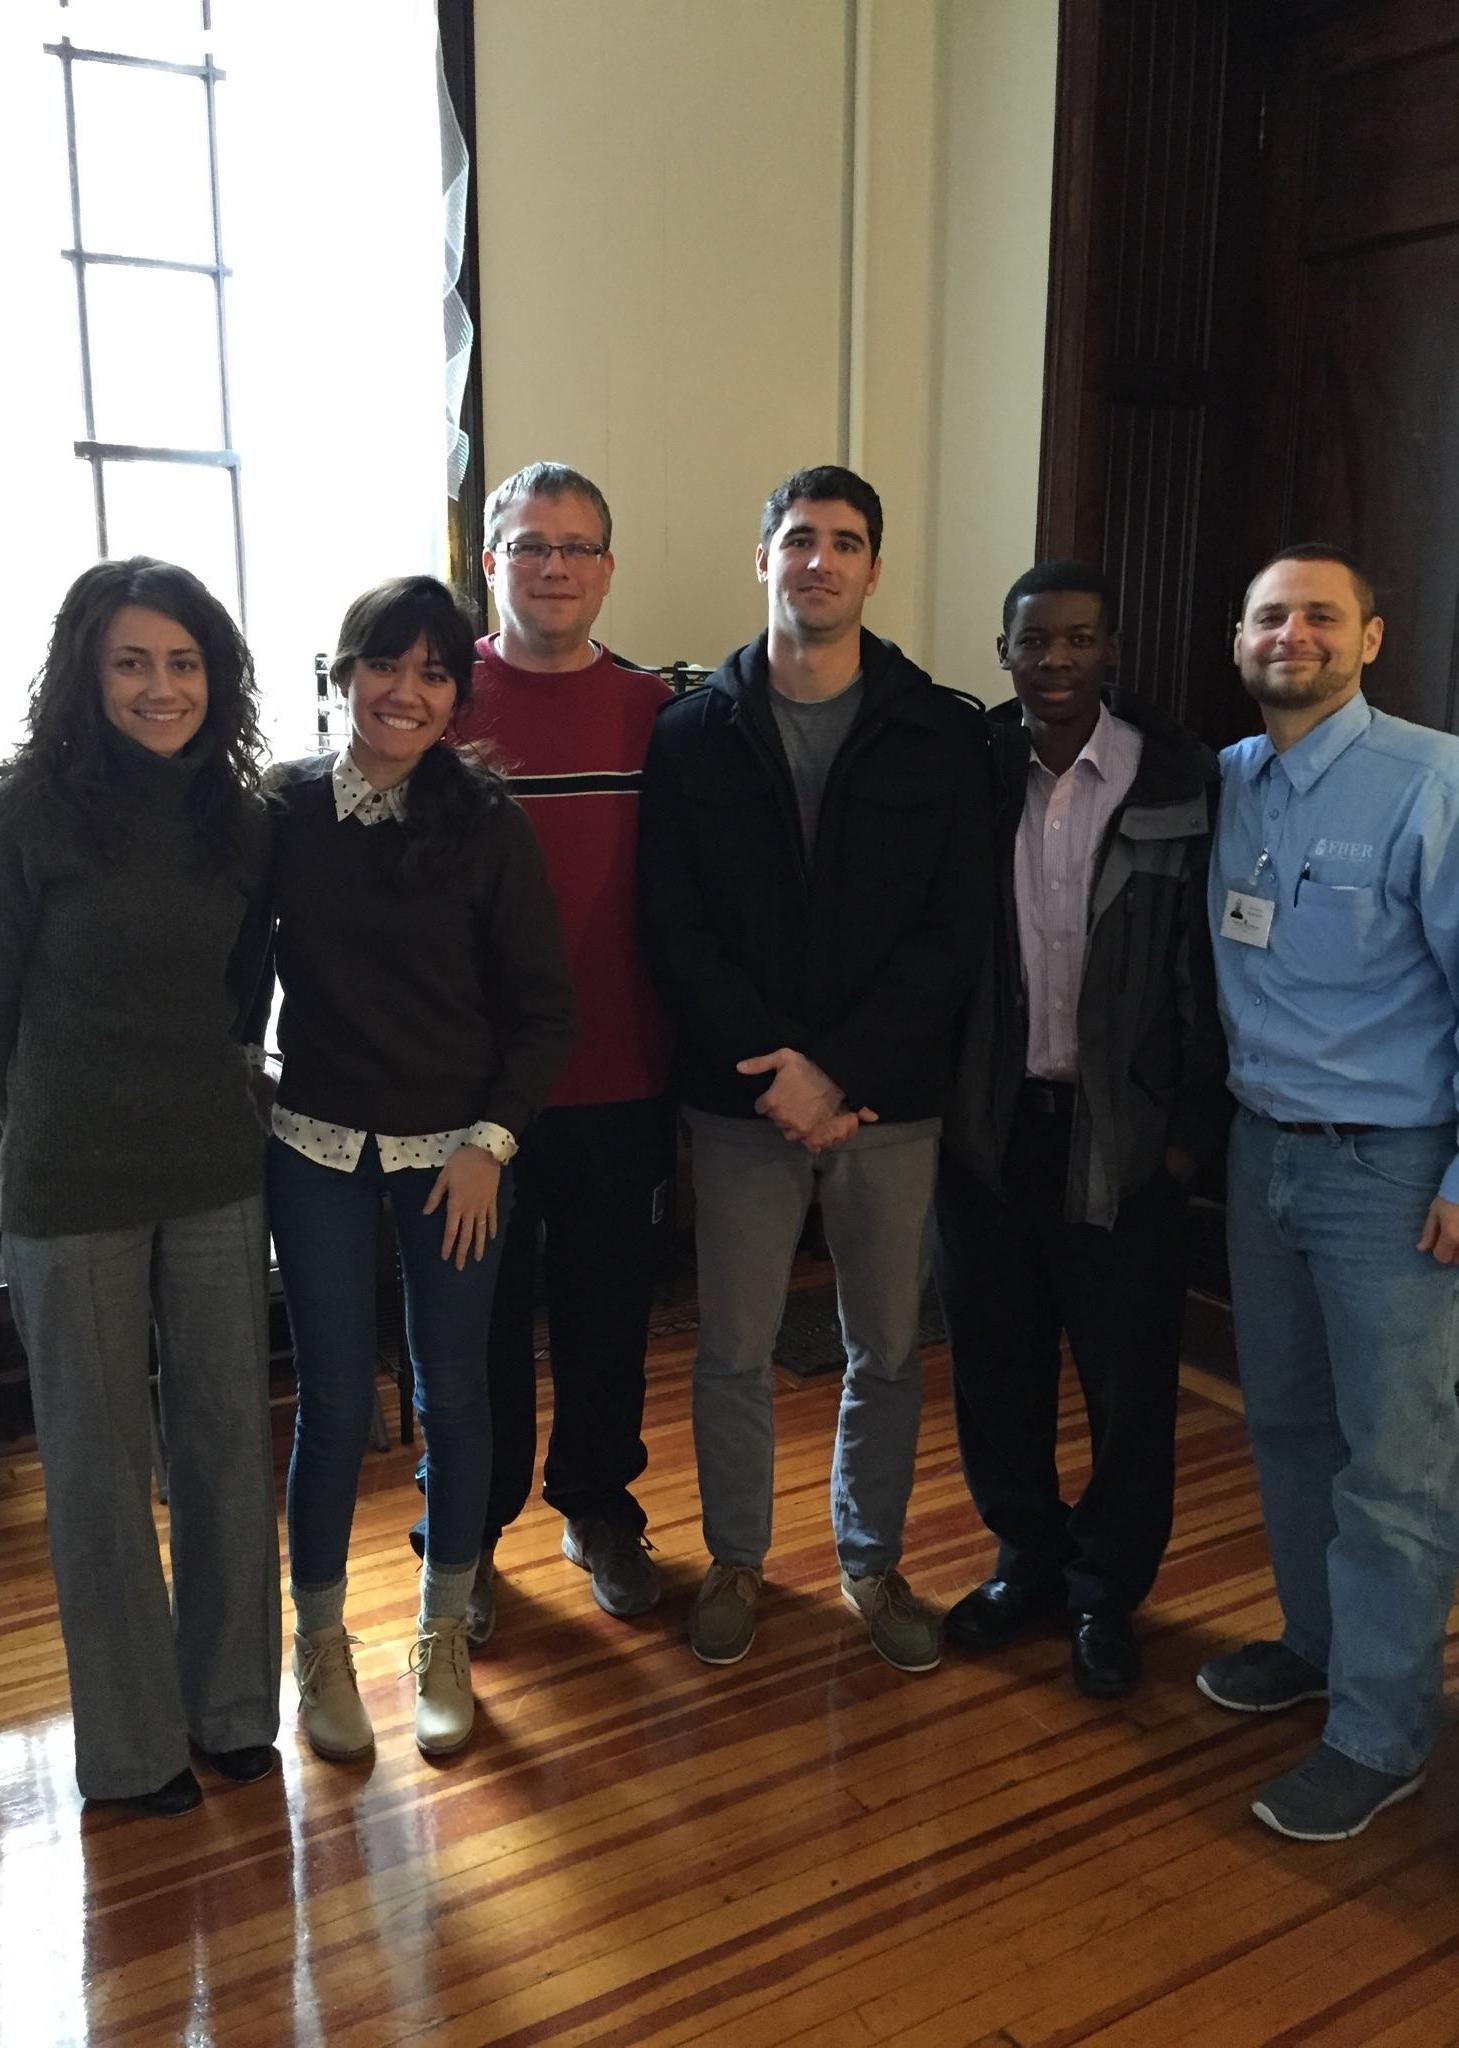 The Compassion Boston Bible Workers (left to right): Alina Terzi, Olivia Ruiz-Knott, Craig Kavanaugh, Richard Cabral, Theophilus Osei, and Ricardo Sanchez.